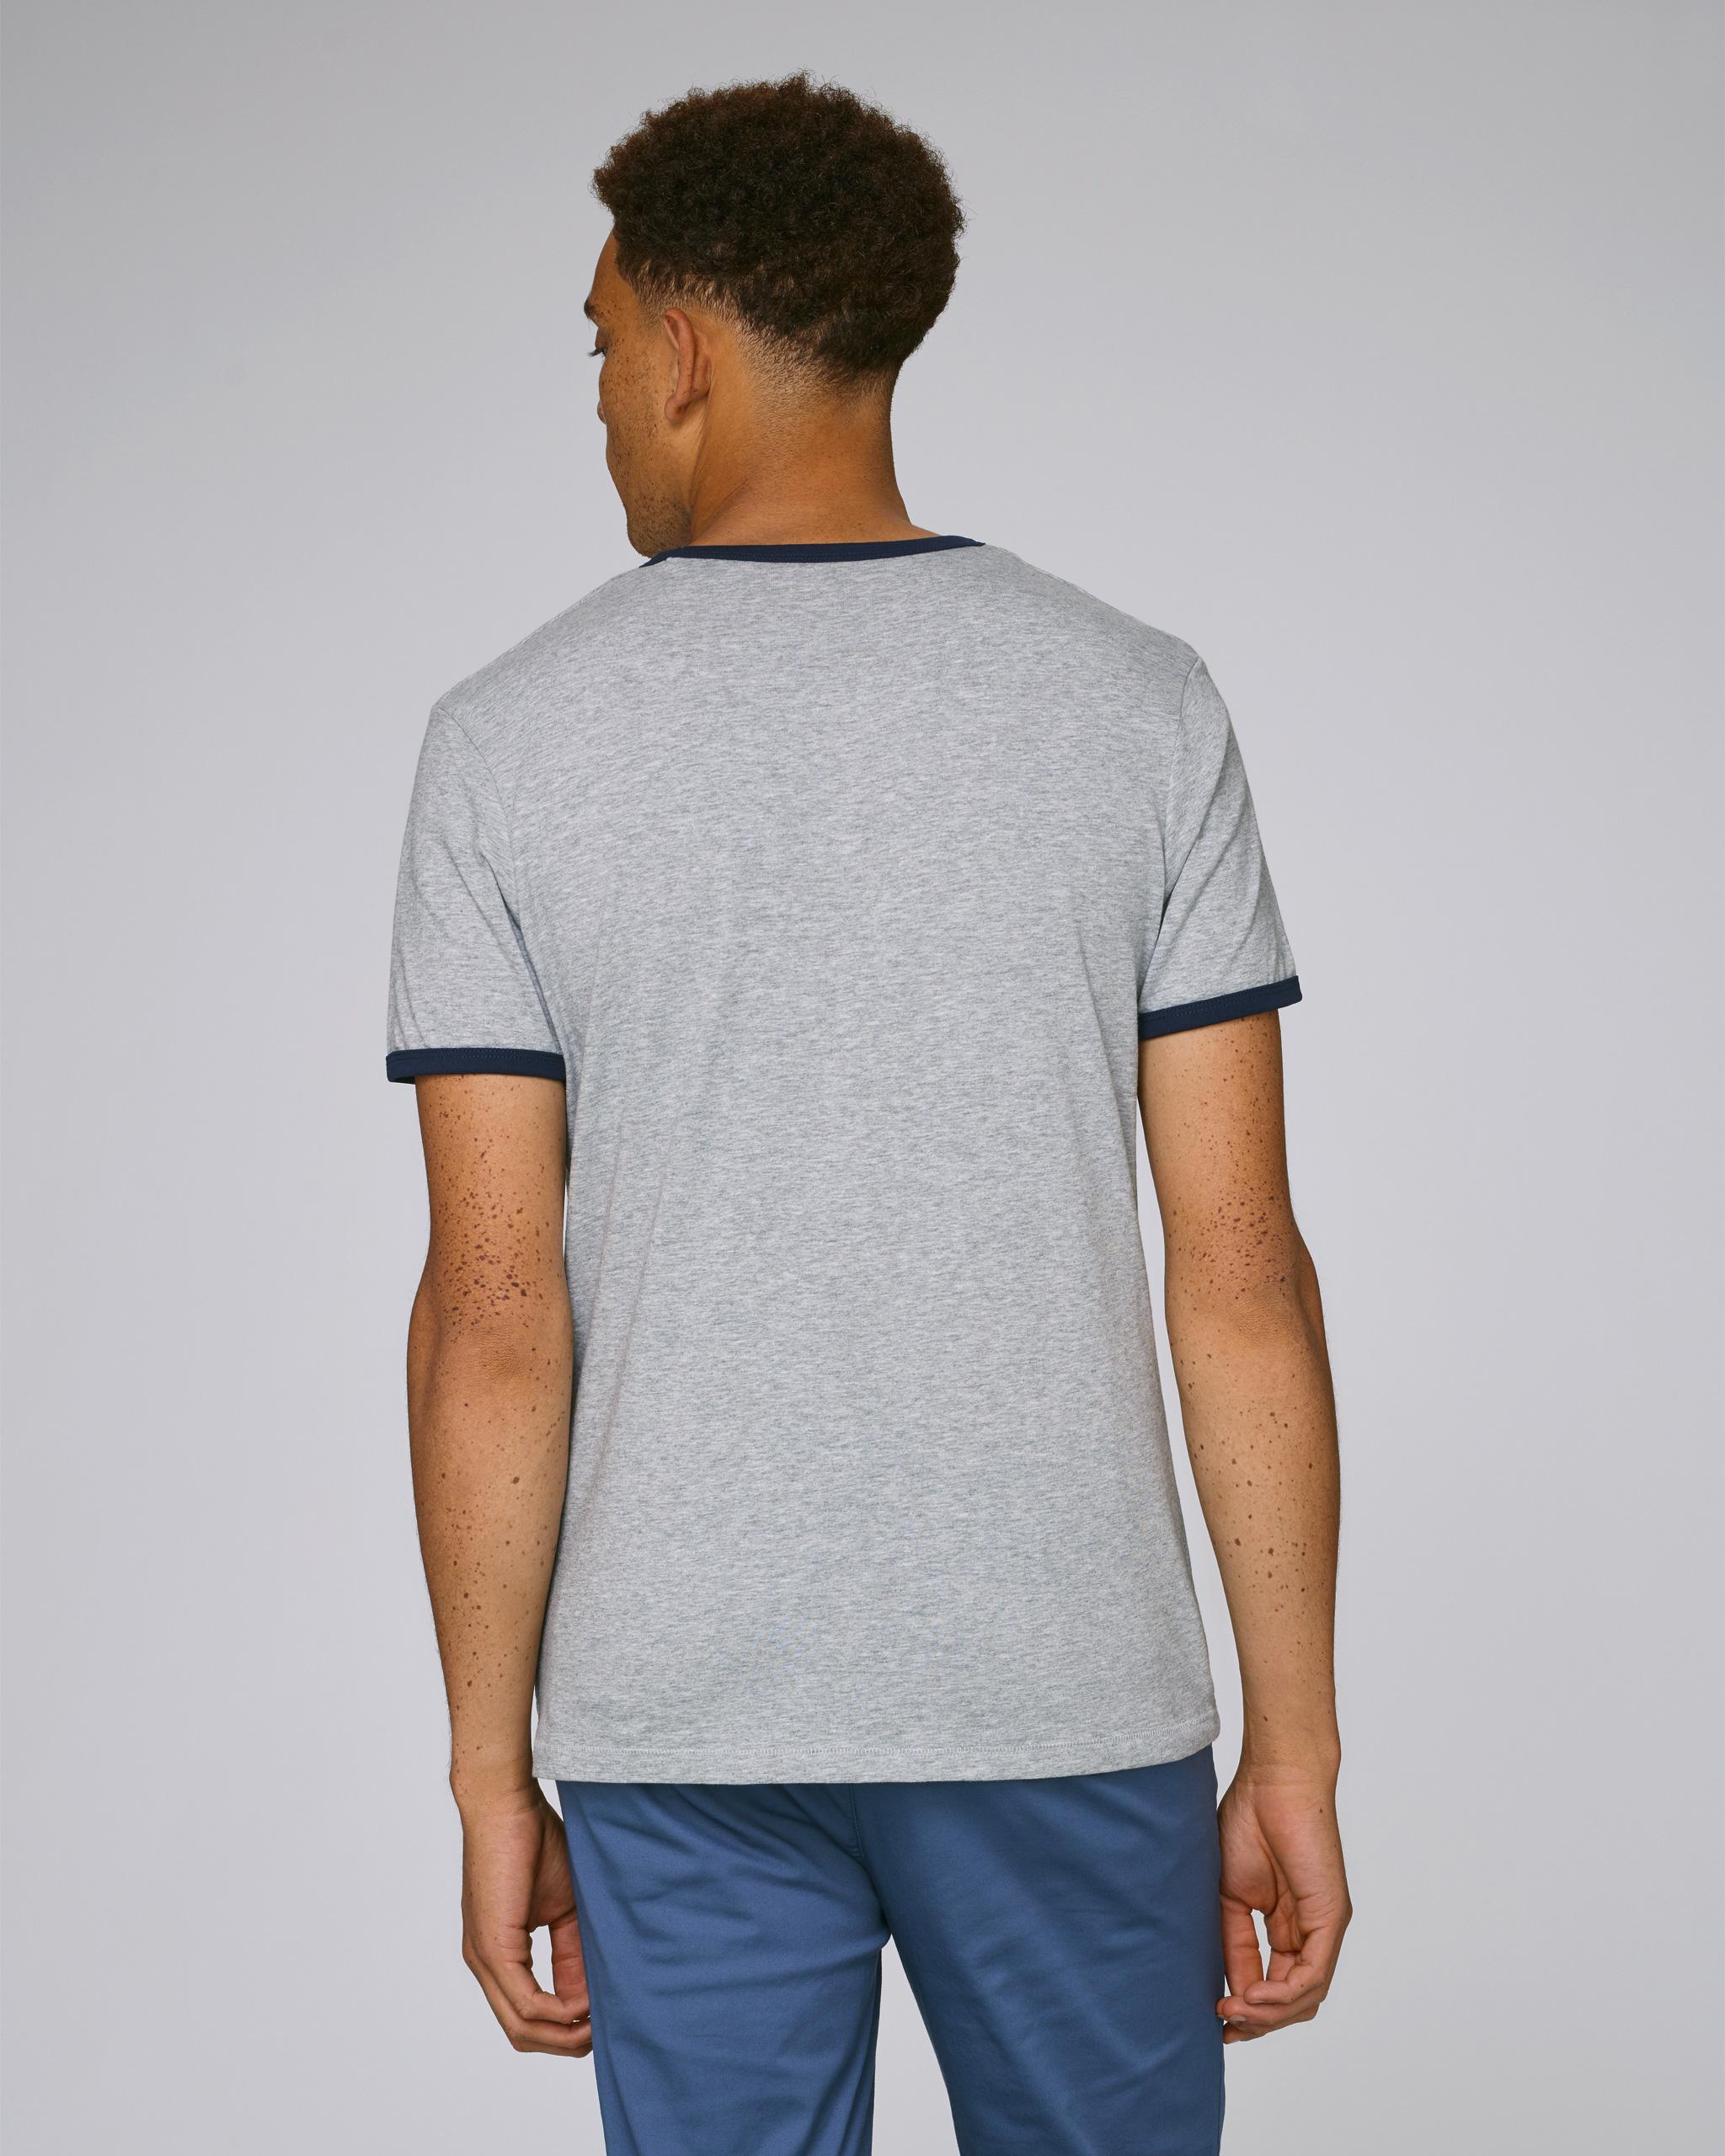 T-Shirt Bio gris Homme dos - Obama tee